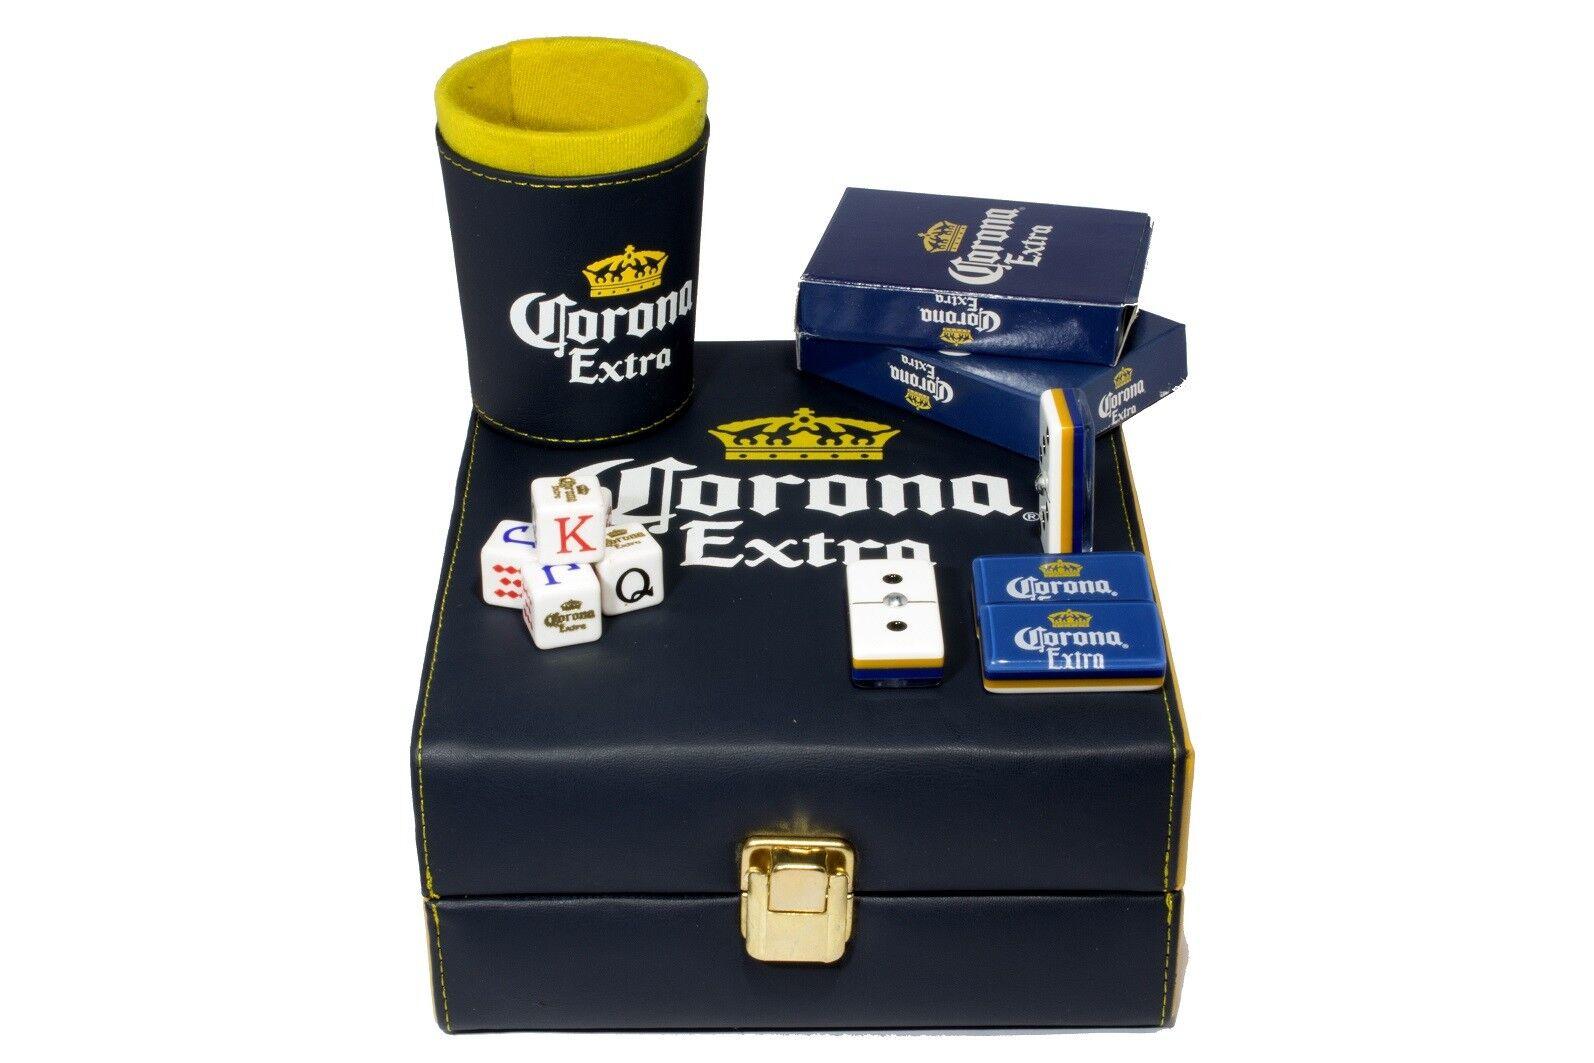 Corona Beer Deluxe Set 3 Games: Domino, Dice Cup, 2 Poker Cards